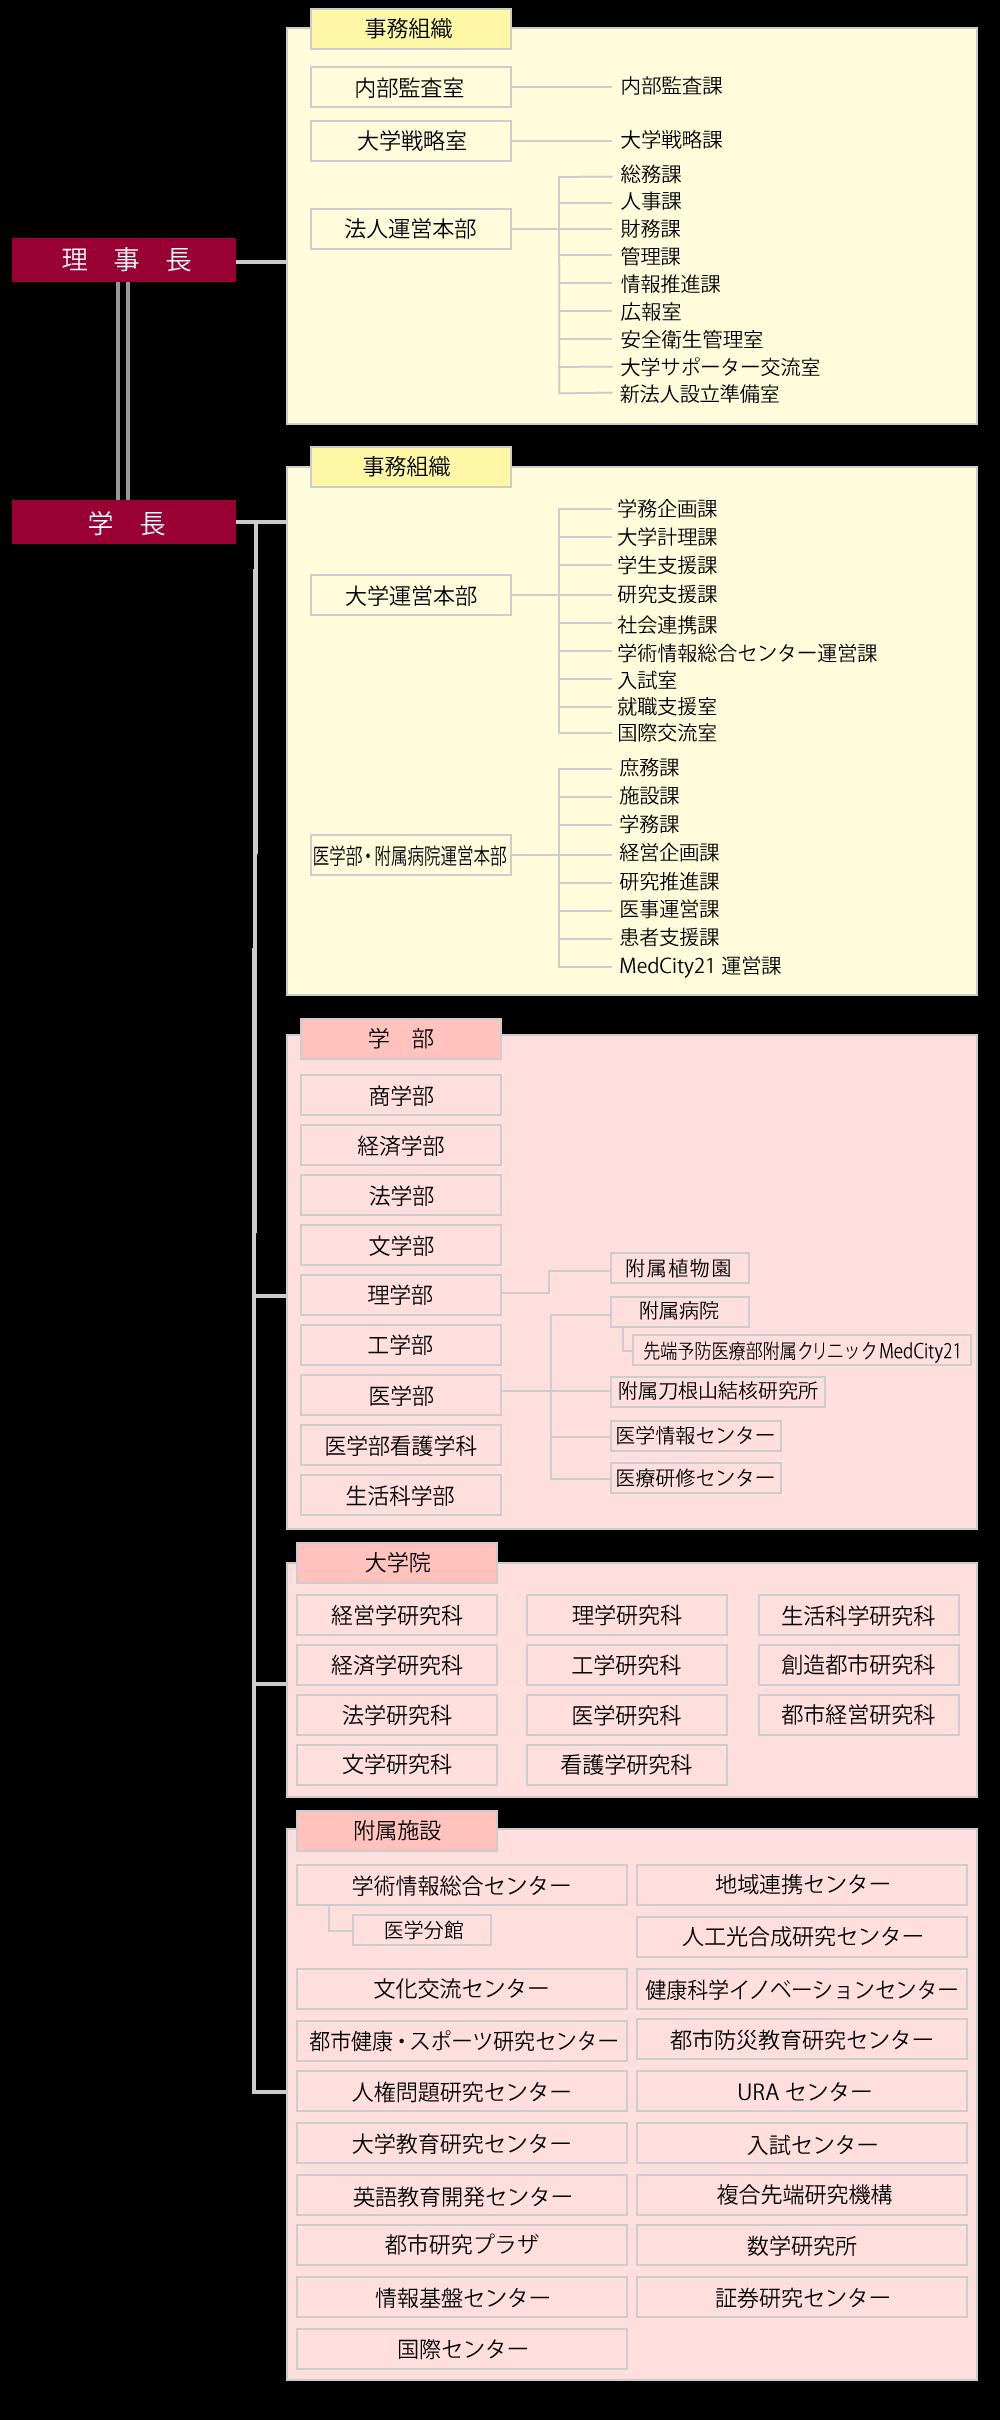 2017-6-22_組織図.png